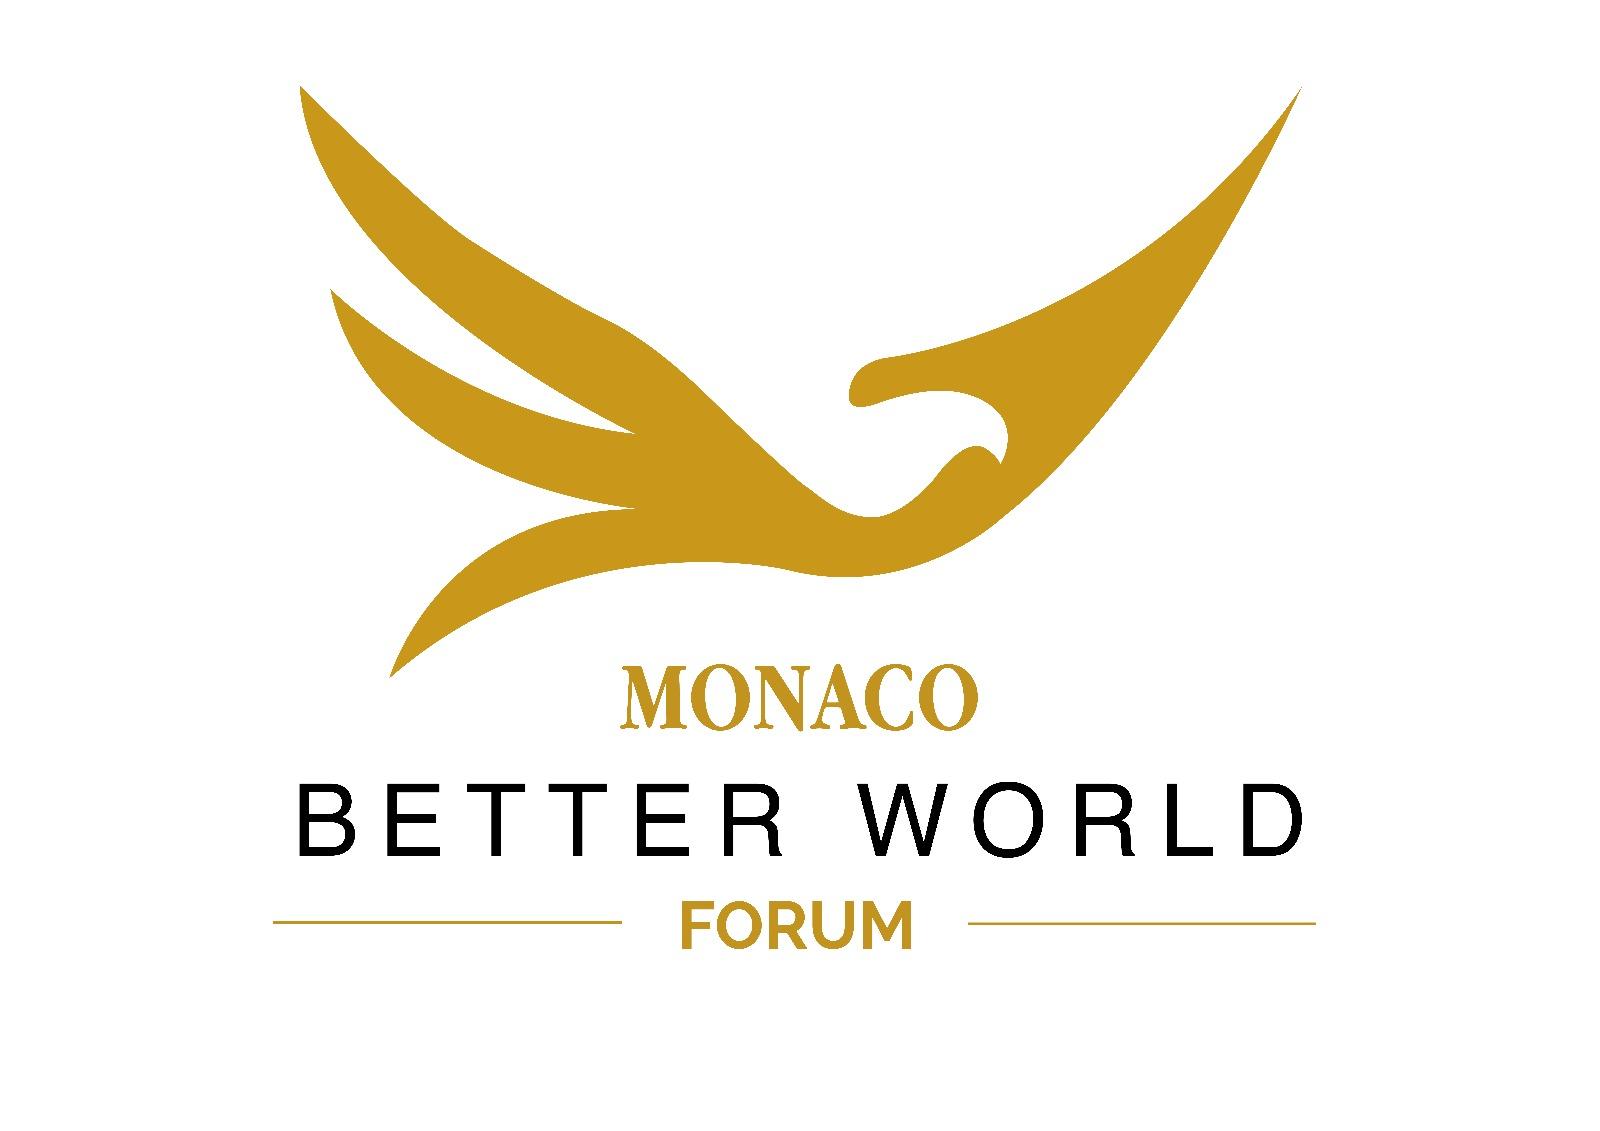 Monaco Better World Forum - Ocean Impact Day